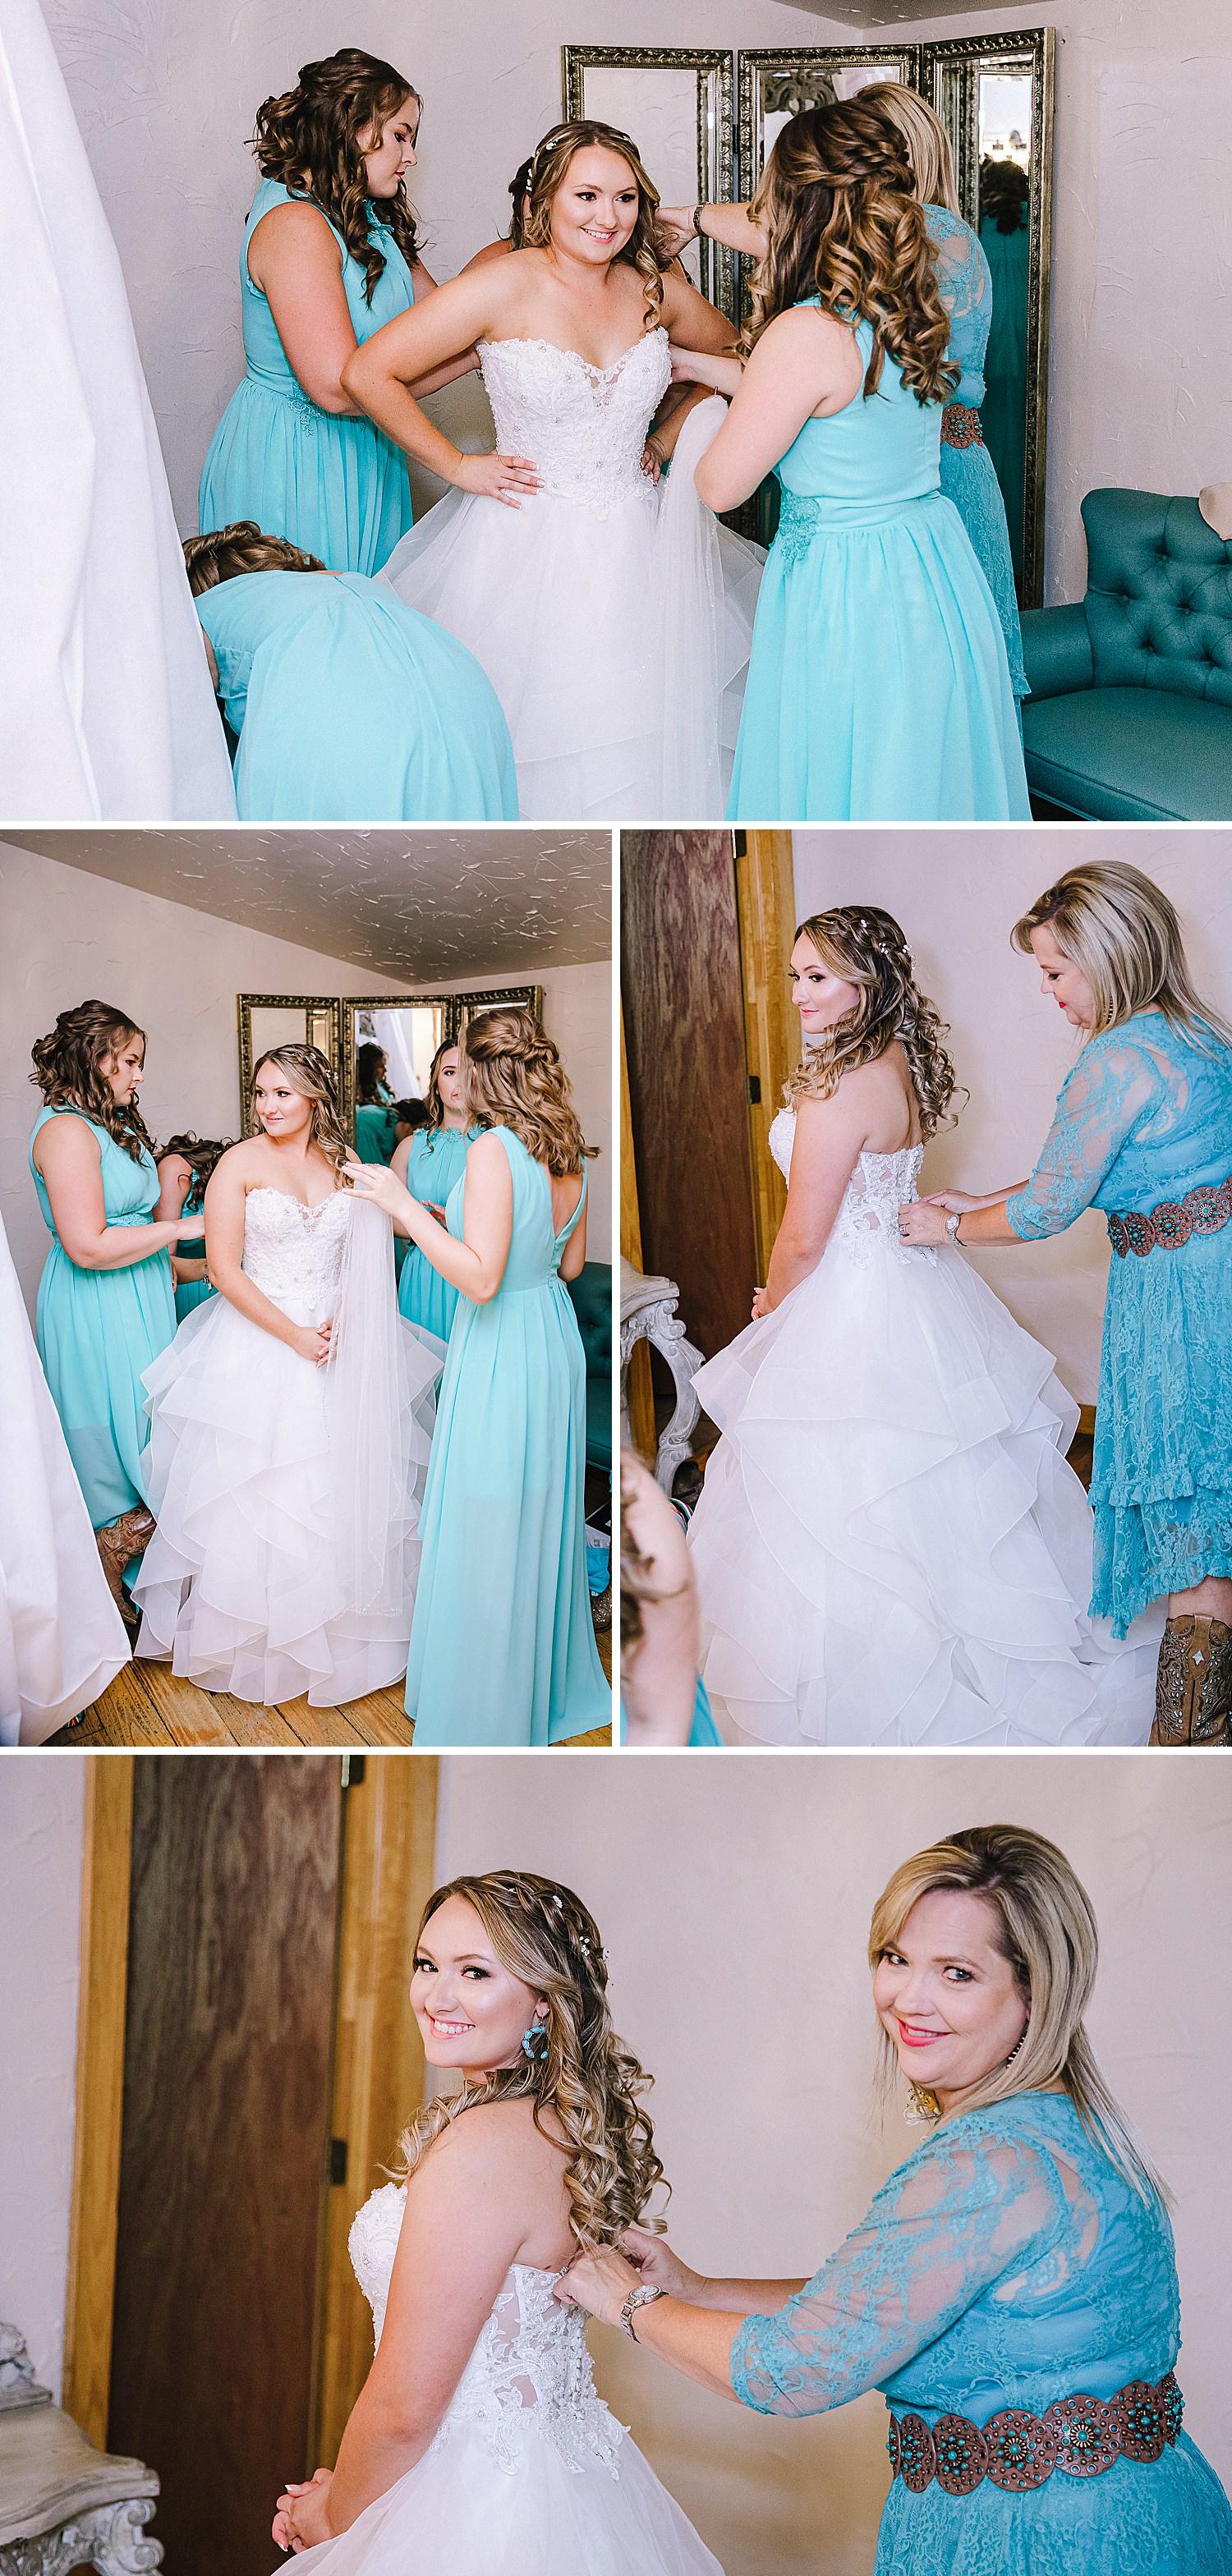 Carly-Barton-Photography-Old-Town-Texas-Rustic-Wedding-Photos-Sunflowers-Boots-Kyle-Texas_0020.jpg